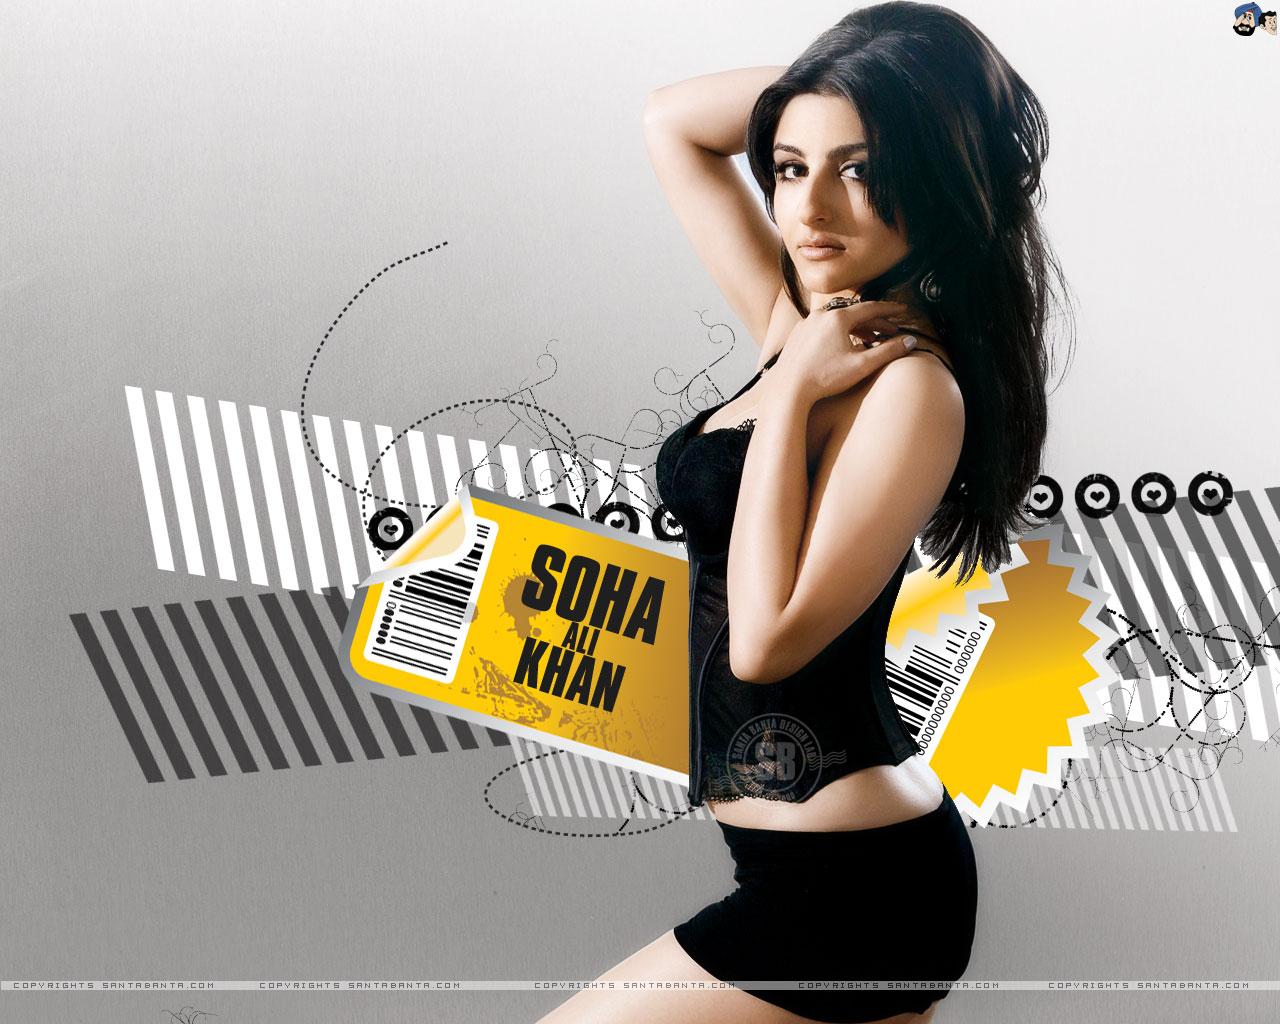 HD Wallpaper Images Collection of Soha Ali Khan HQ